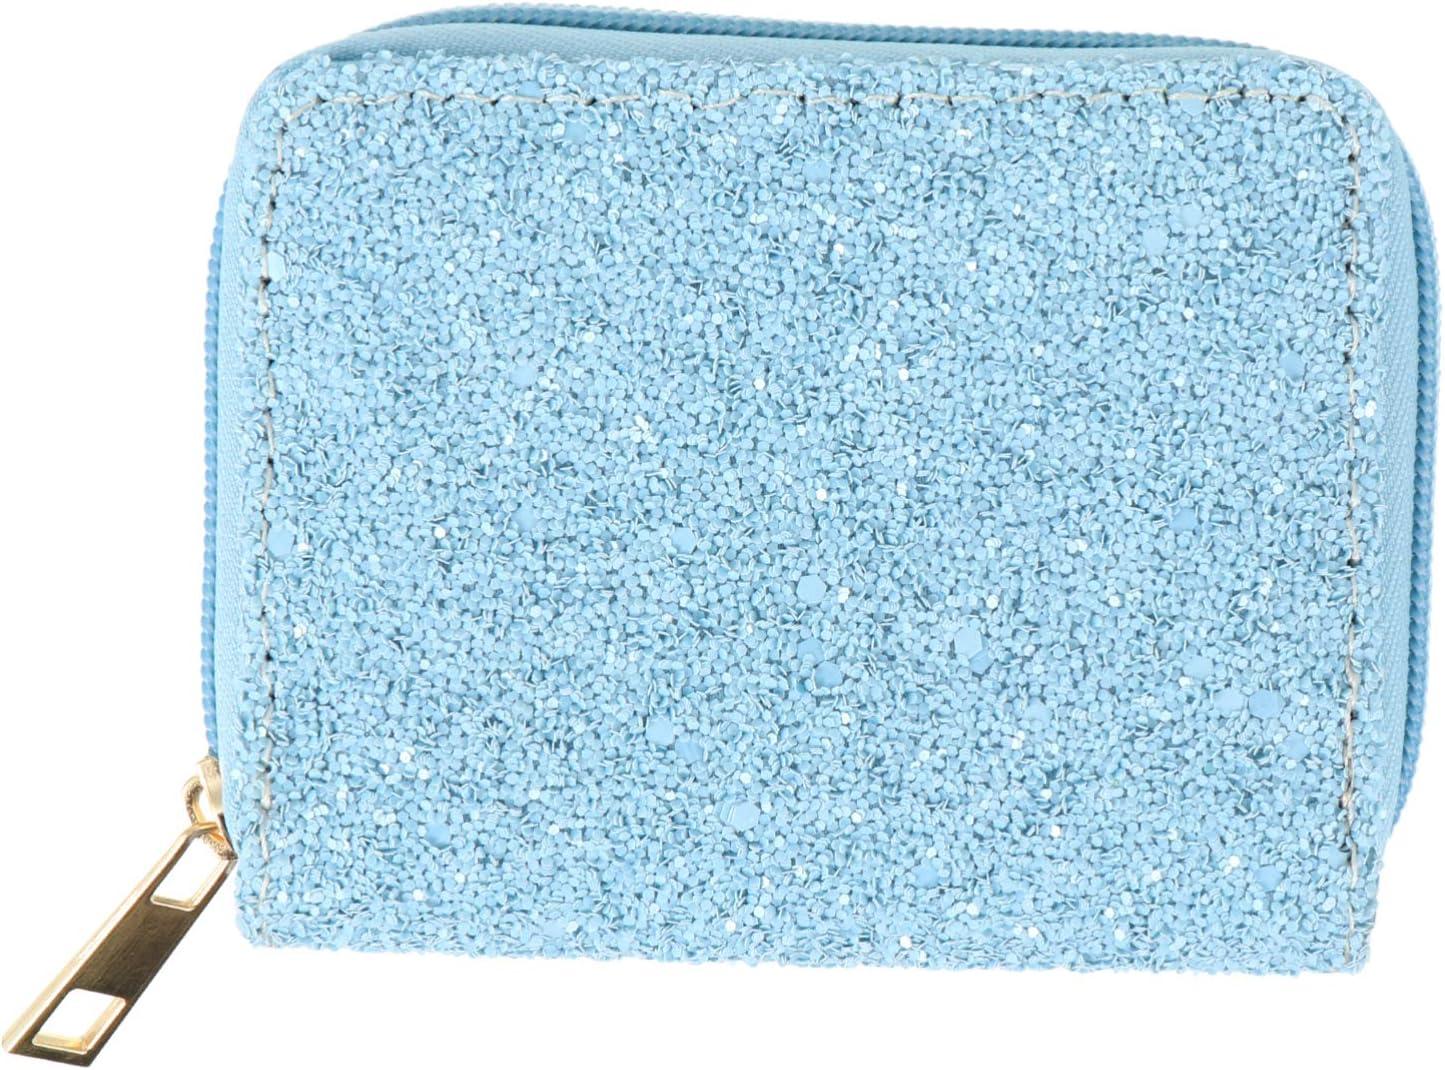 Amosfun Women Coin Purse PU Leather Coin Pouch Small Zipper Storage Bag Women Wallet